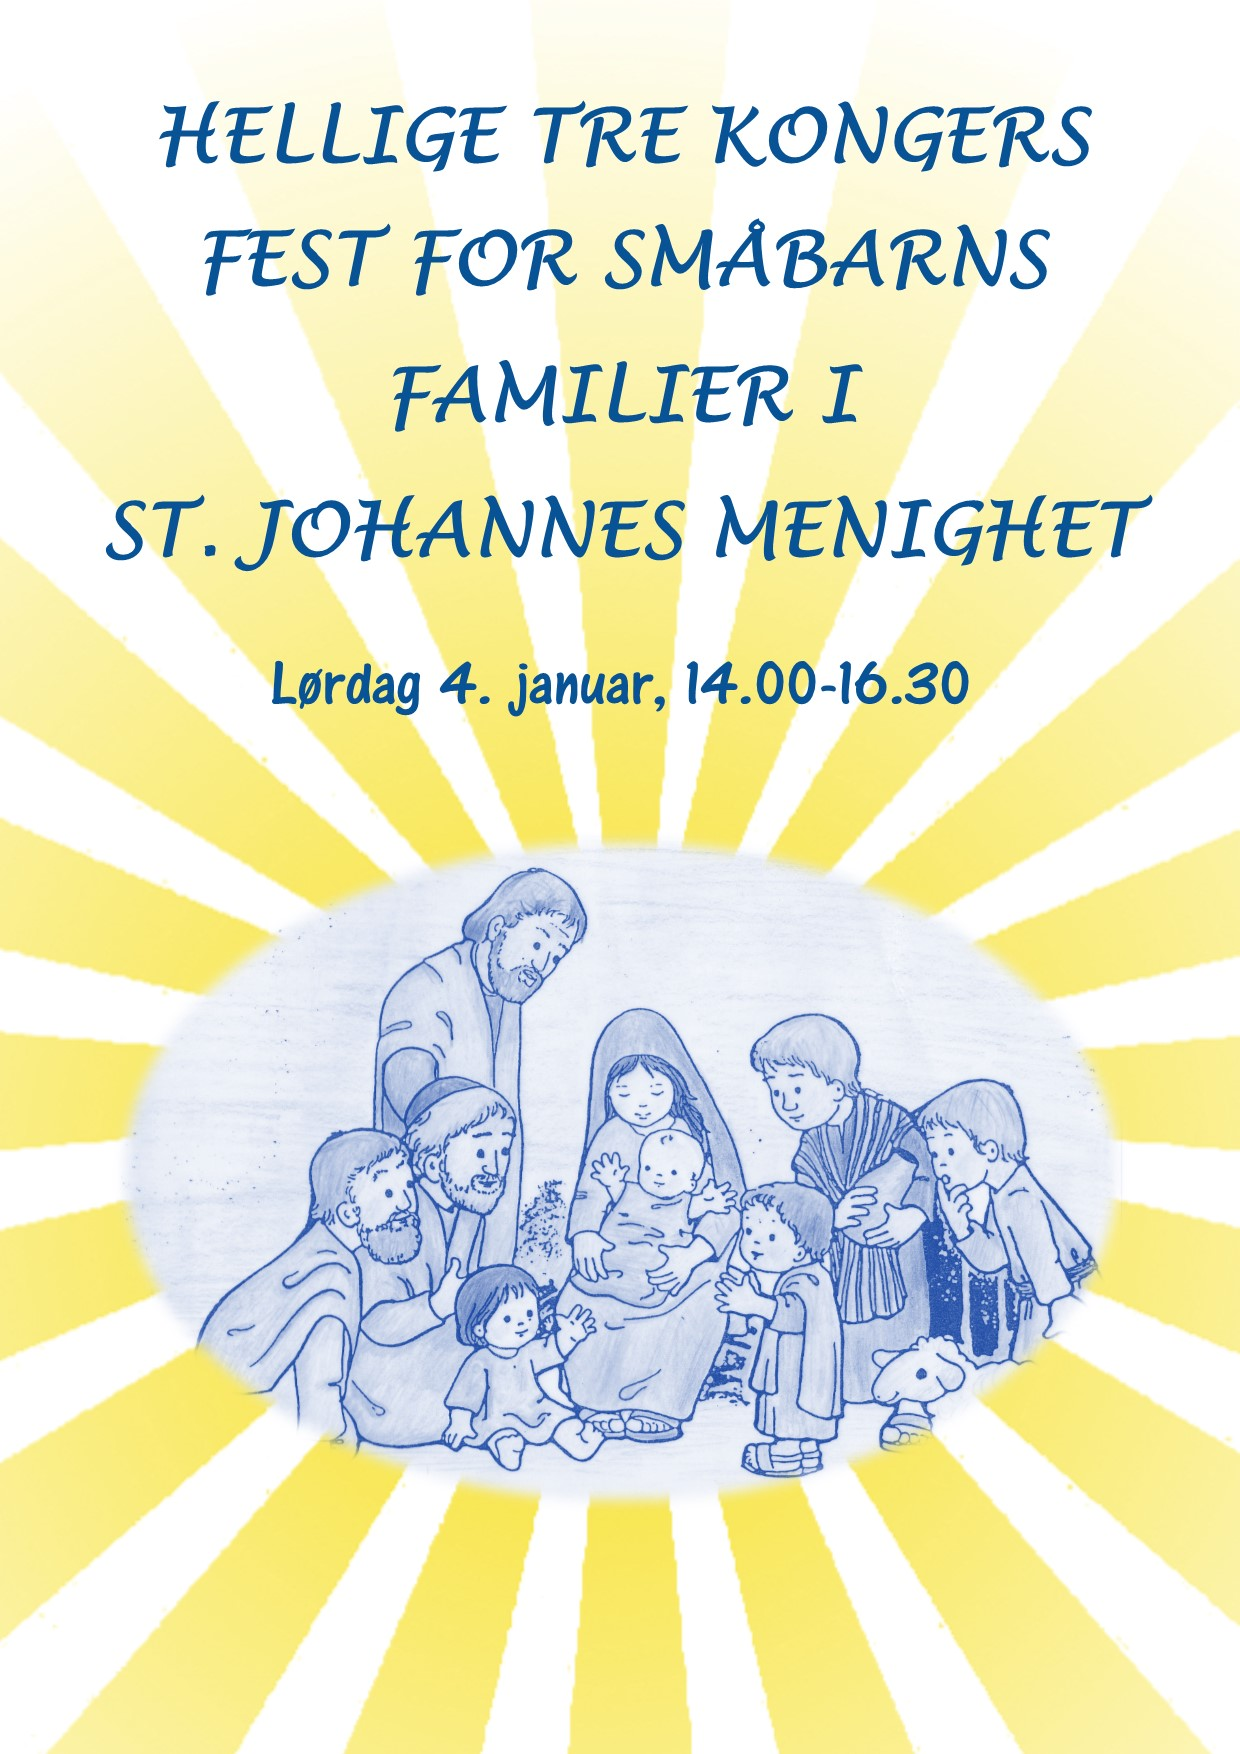 Hellige tre kongersfest 4. januar 2020